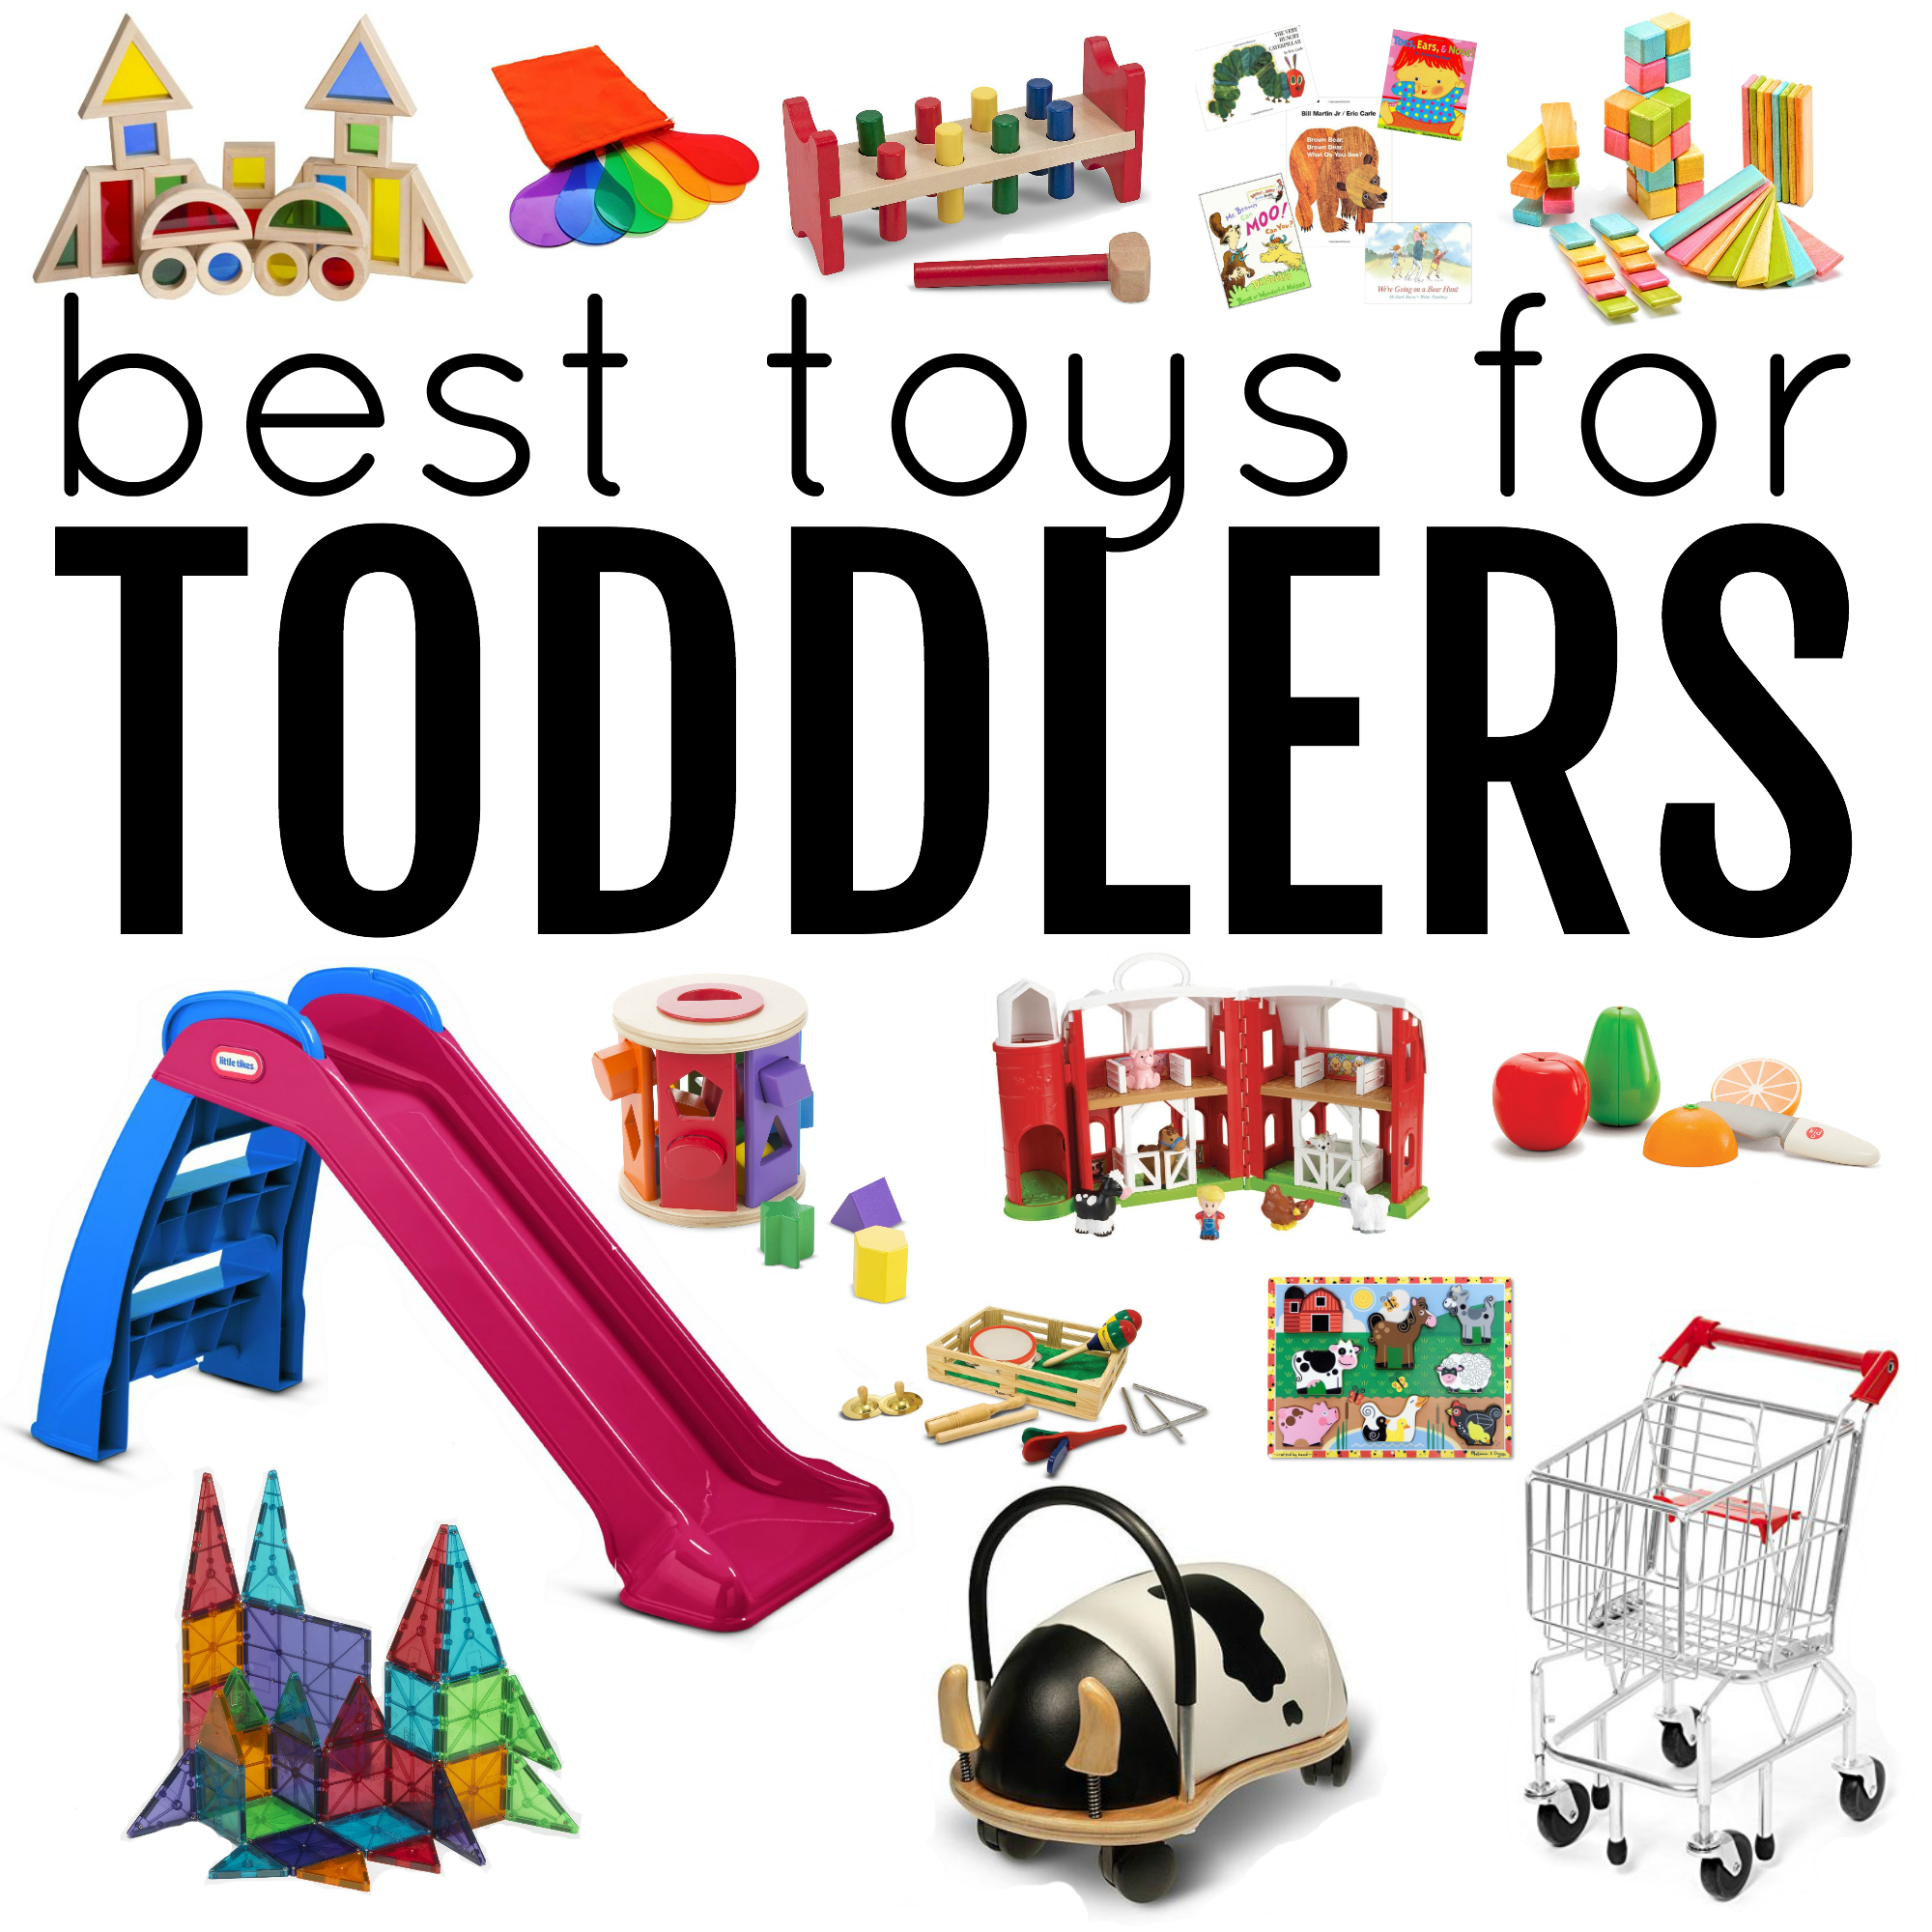 19 Best Toddler Toys | Best toddler toys, Toddler toys ...